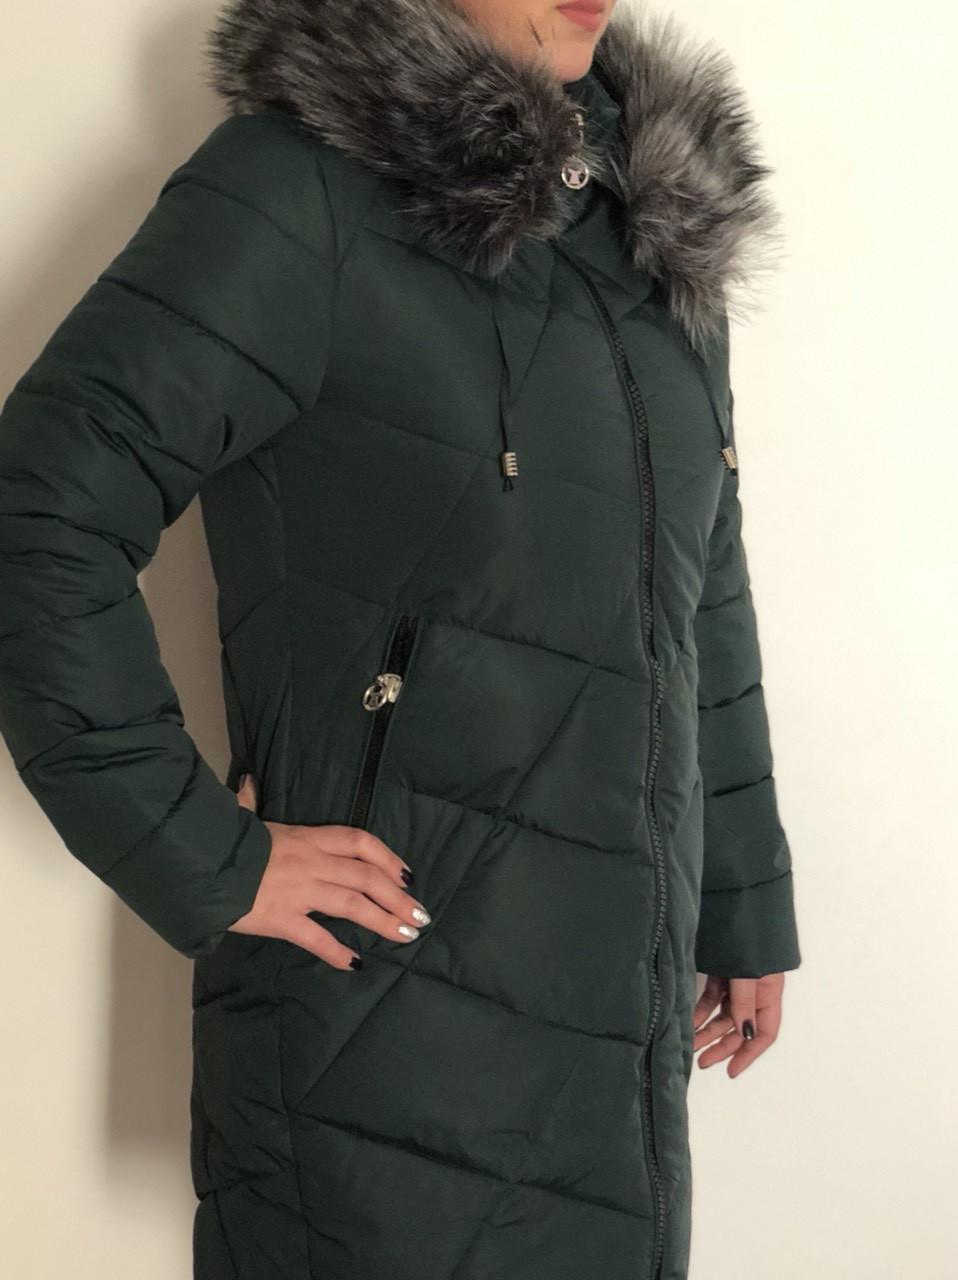 133b1bb2 Женская куртка зима батал 2018: продажа, цена в Хмельницком. куртки ...